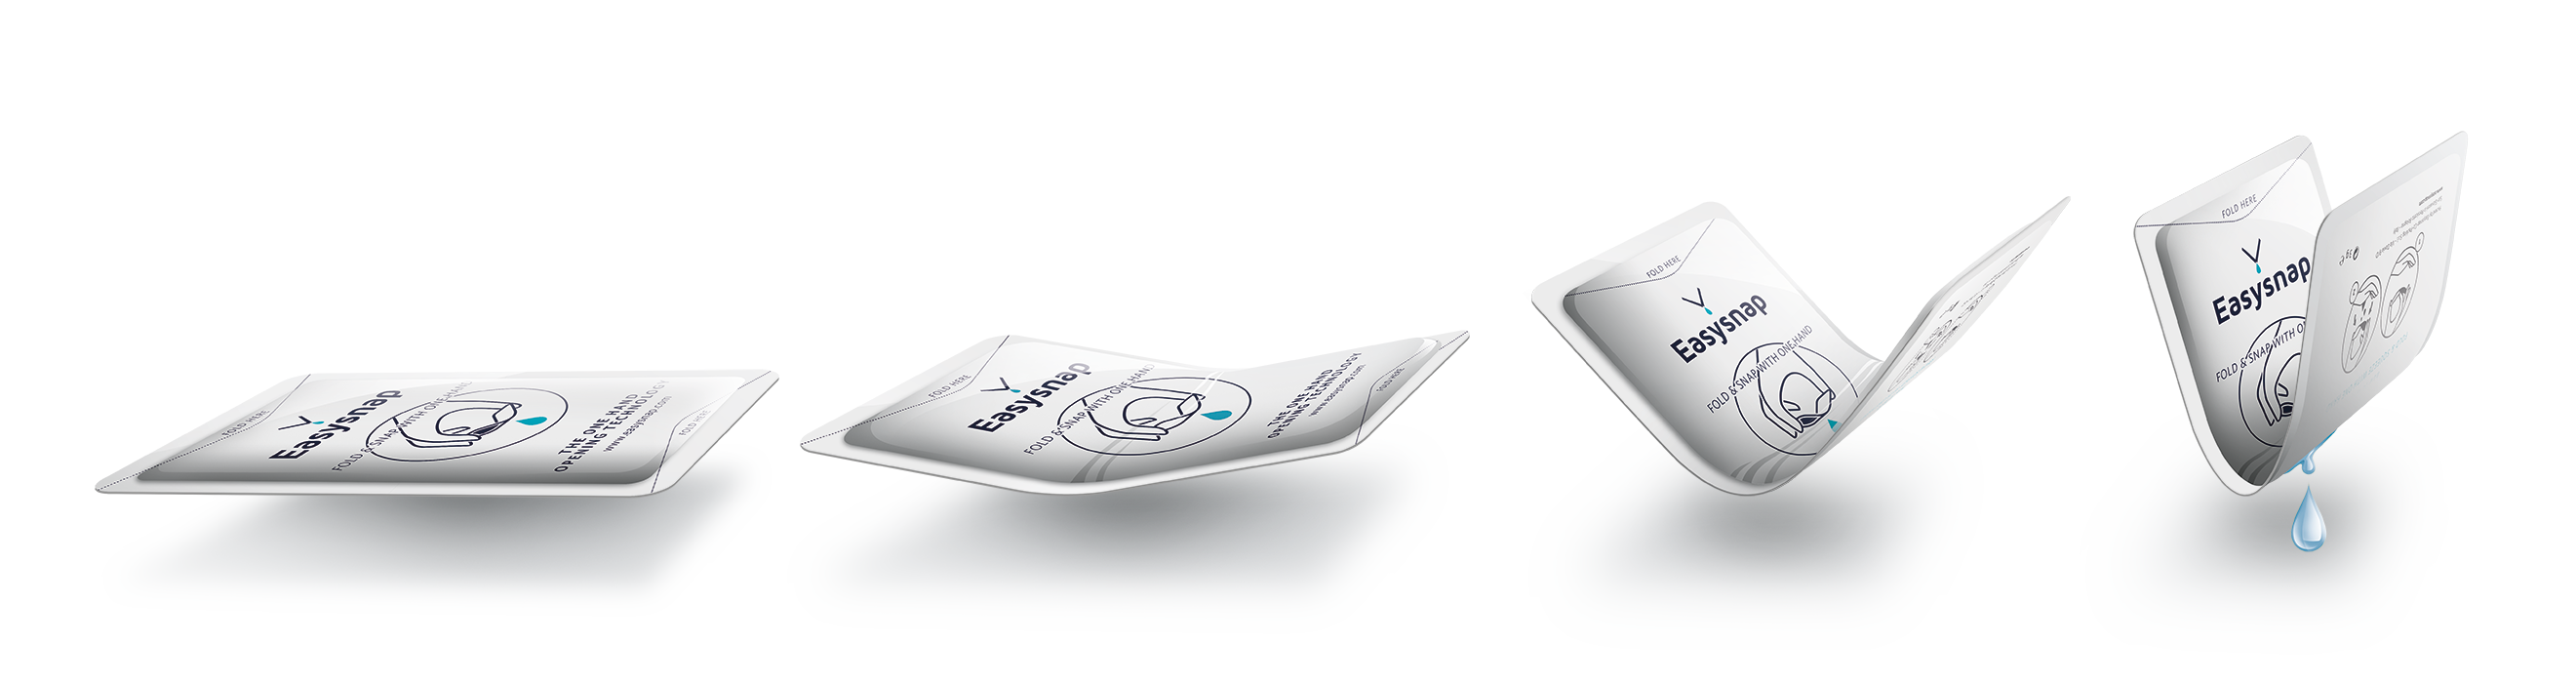 Biosnap Easysnap Packaging Technology